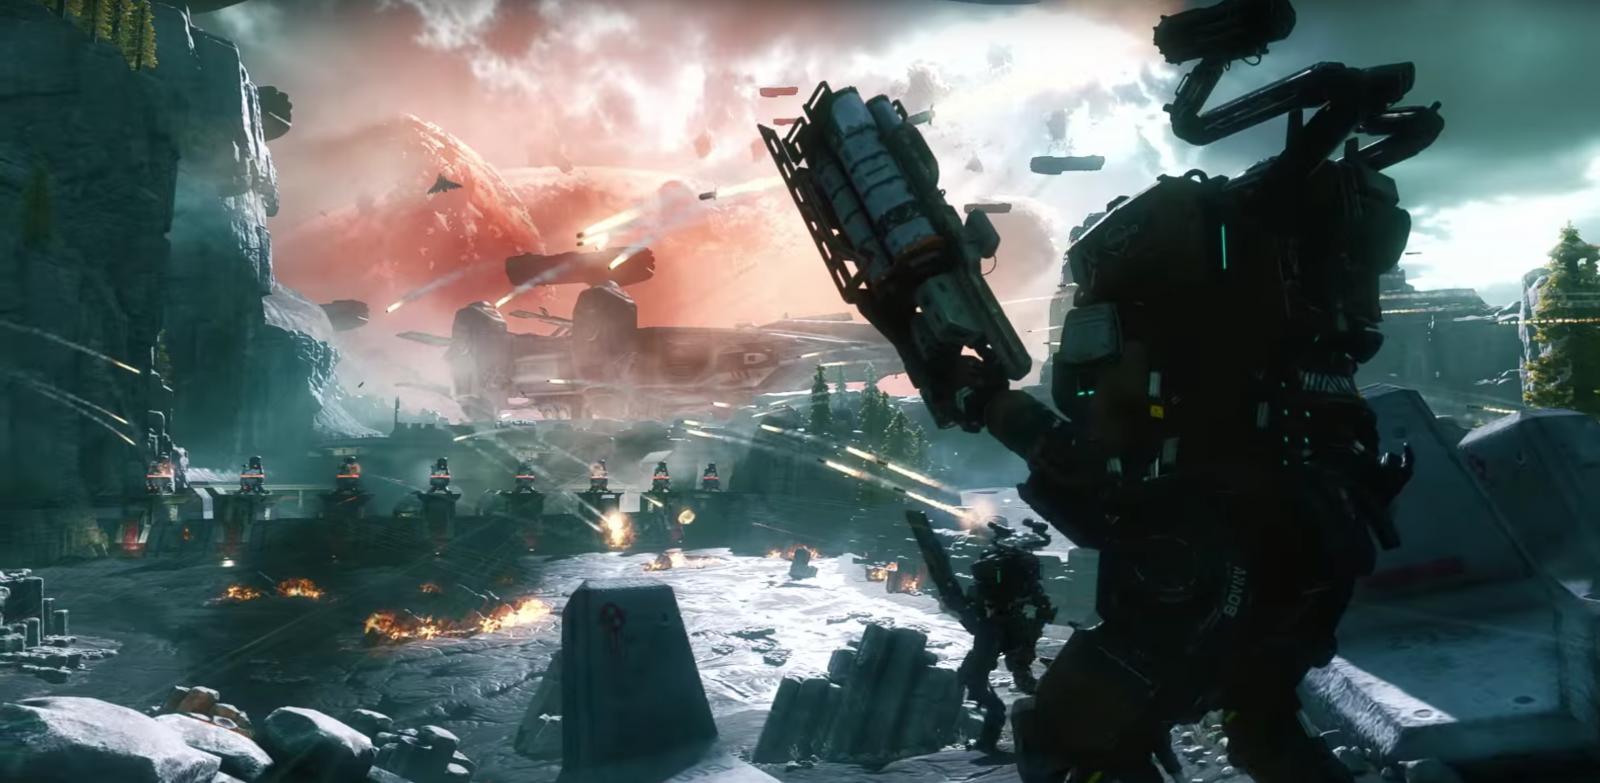 Titanfall 2 E3 2016 trailer image